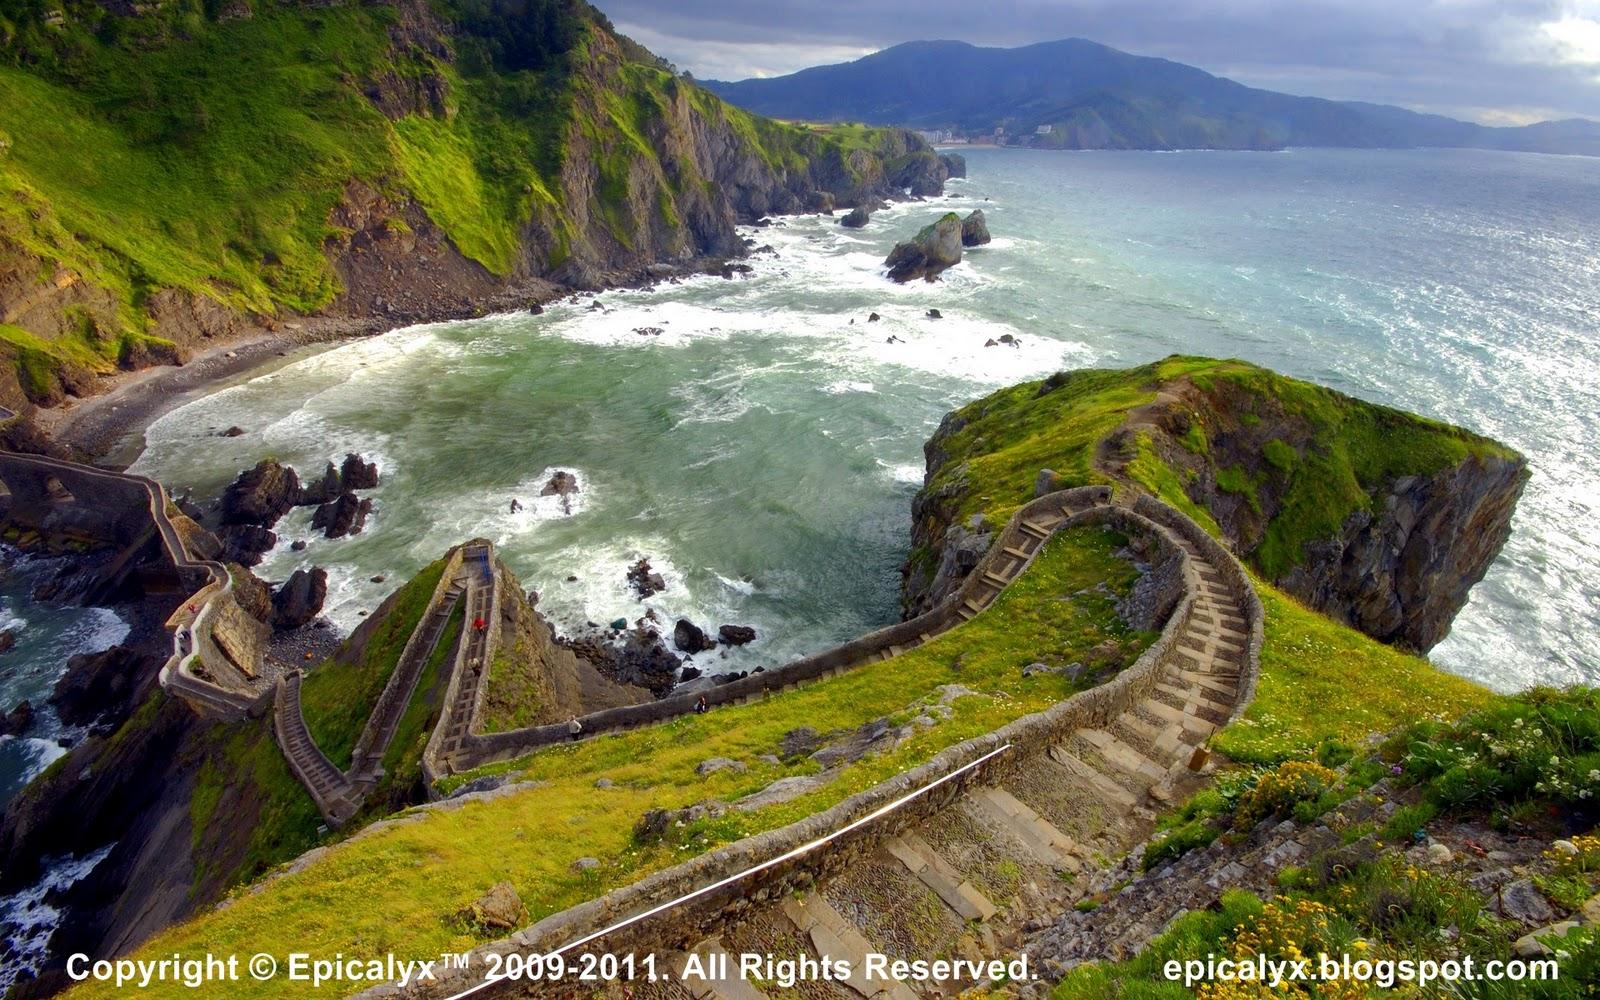 http://3.bp.blogspot.com/-YZxdAY21rpM/TsDVLnNSEvI/AAAAAAAAAKw/wXzYEeGFUhQ/s1600/Hill.jpg